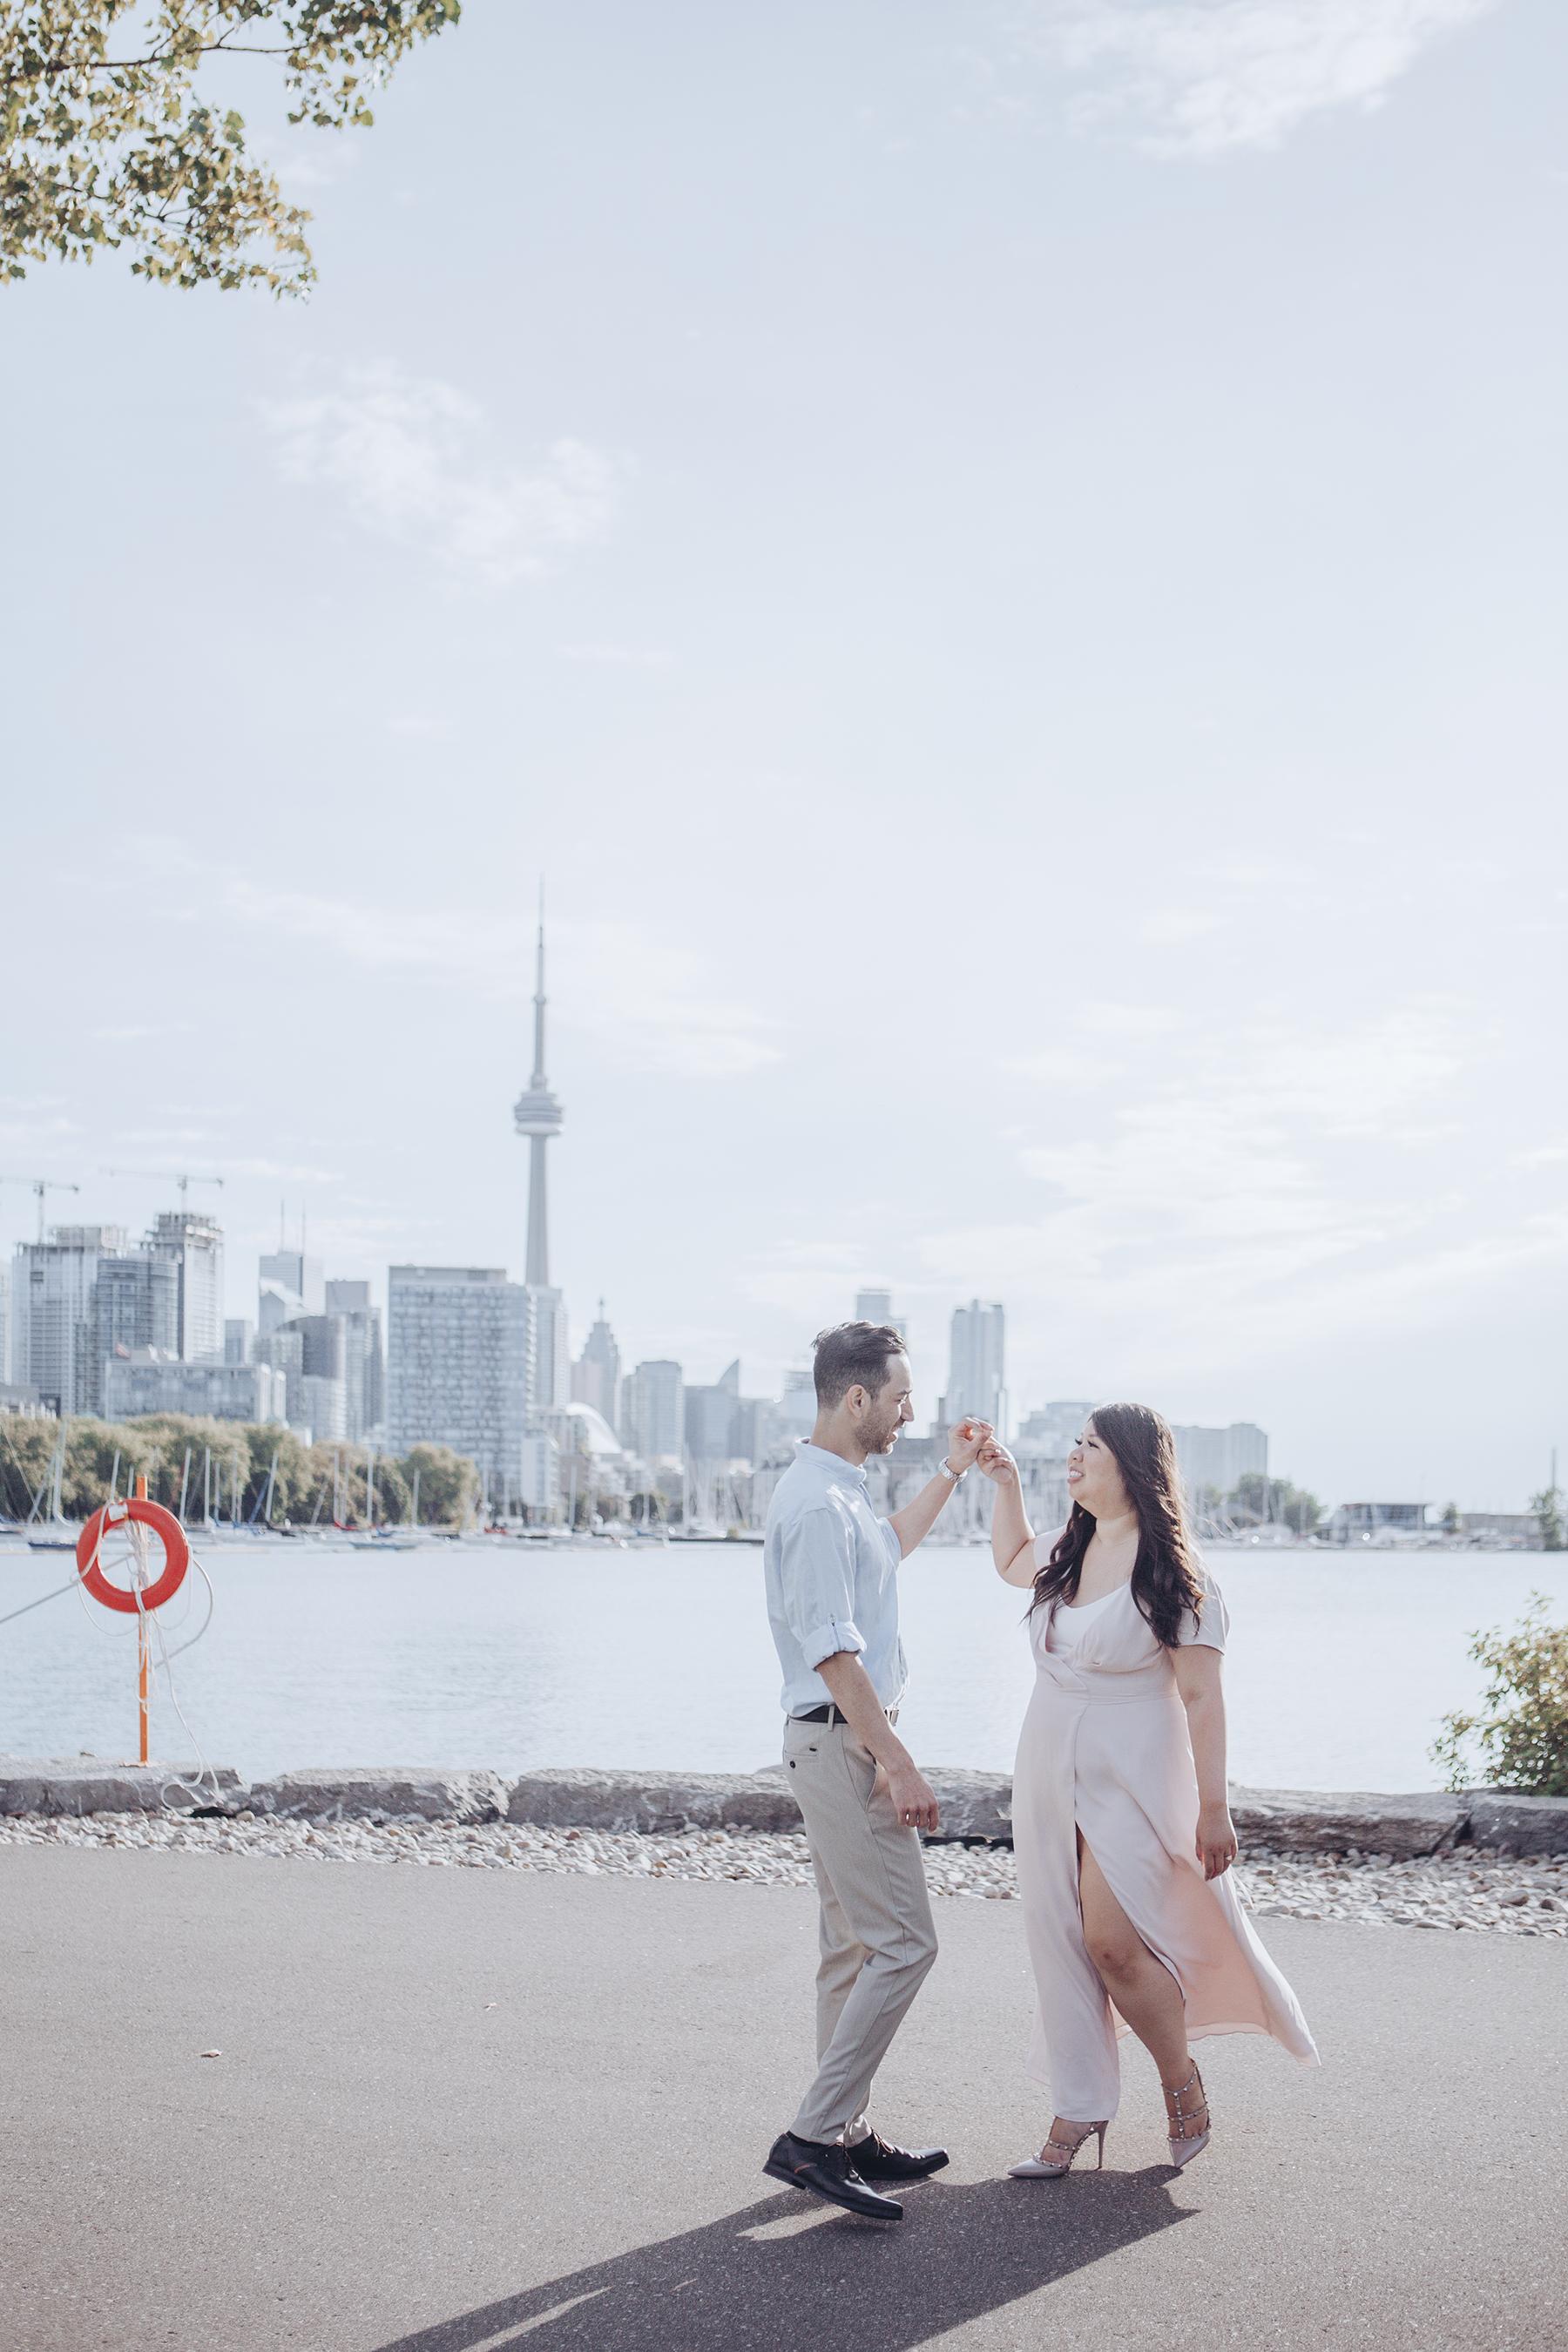 Trillium Park Engagement Session in Toronto Lisa Vigliotta Photography04